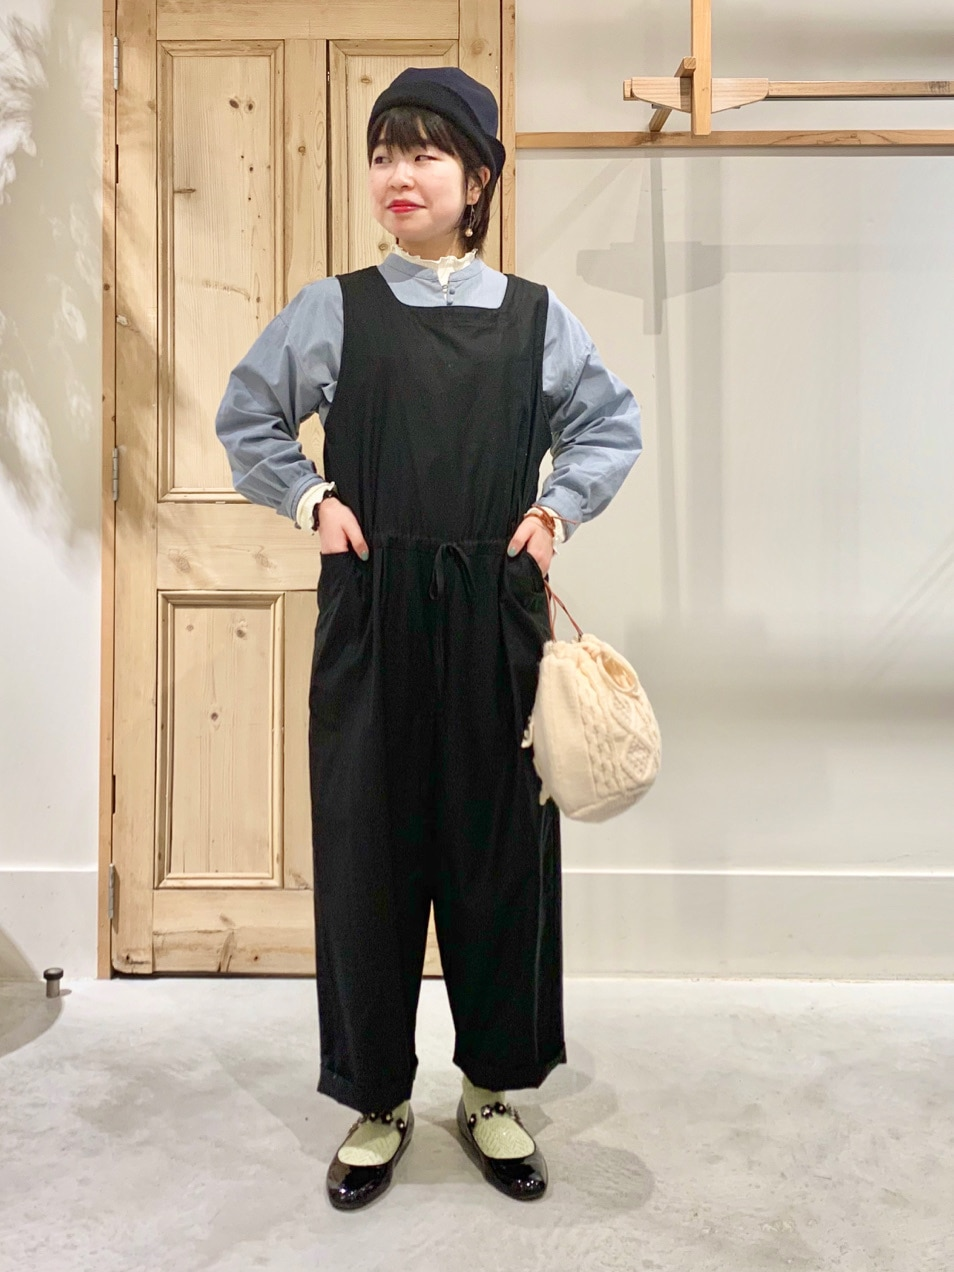 Malle chambre de charme 調布パルコ 身長:153cm 2021.01.18